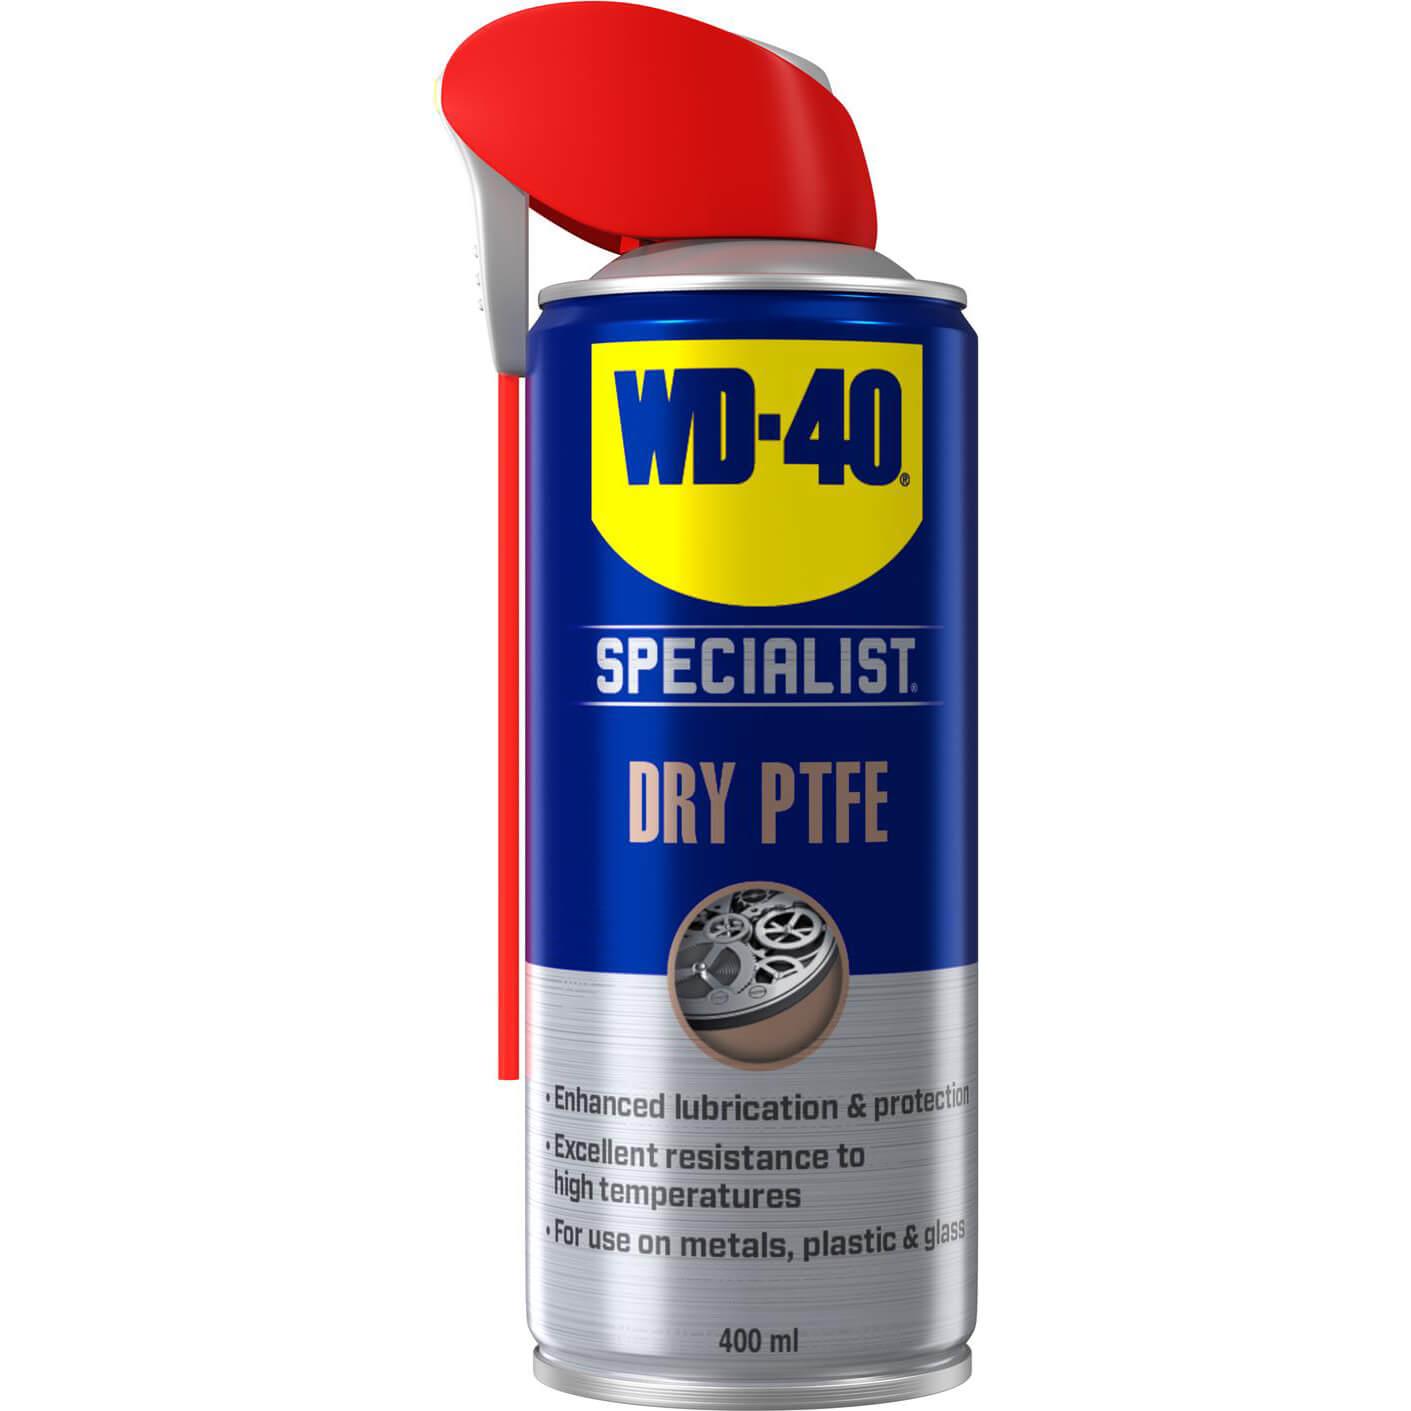 Image of WD40 Specialist Dry PTFE Lubricant Aerosol Spray 400ml